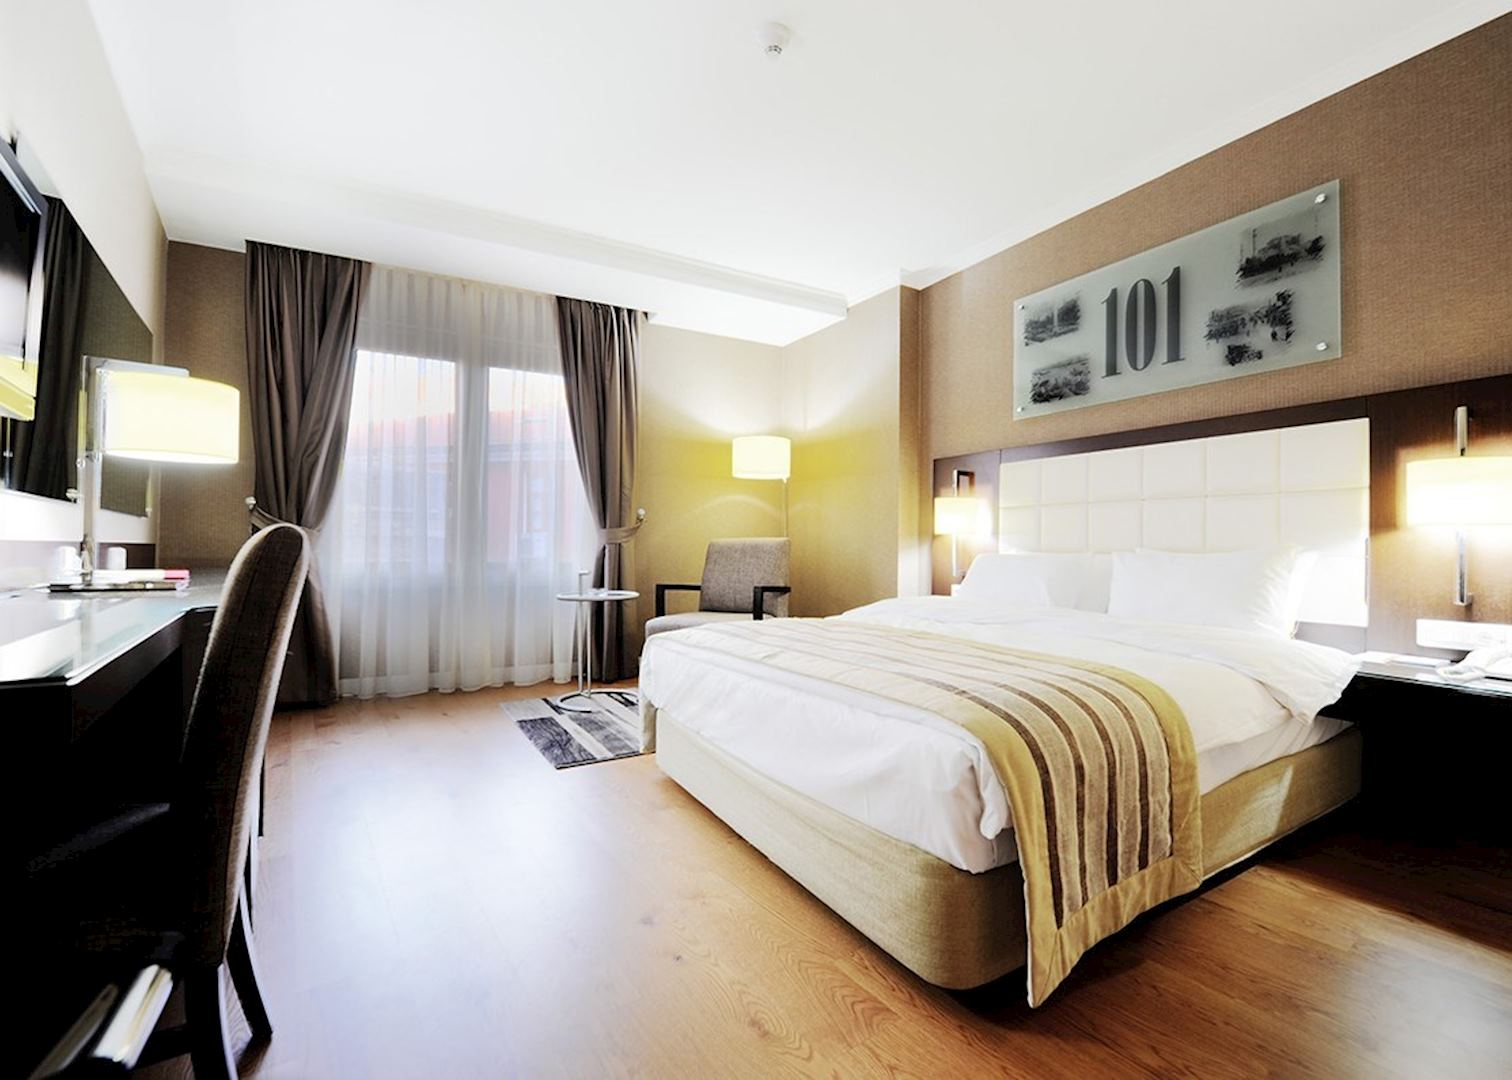 kent hotel hotels in istanbul audley travel. Black Bedroom Furniture Sets. Home Design Ideas